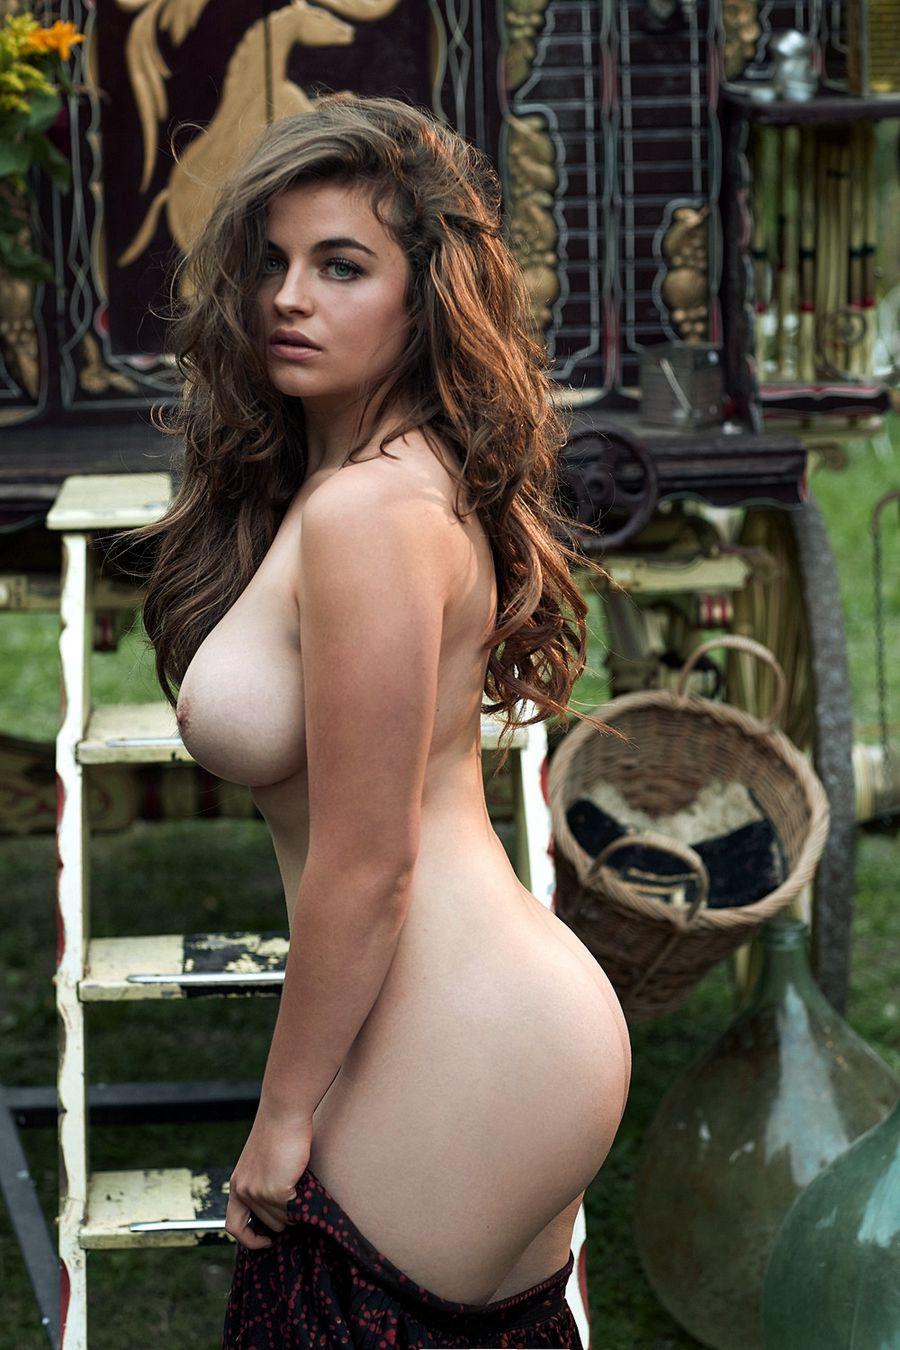 Actresses posing nude